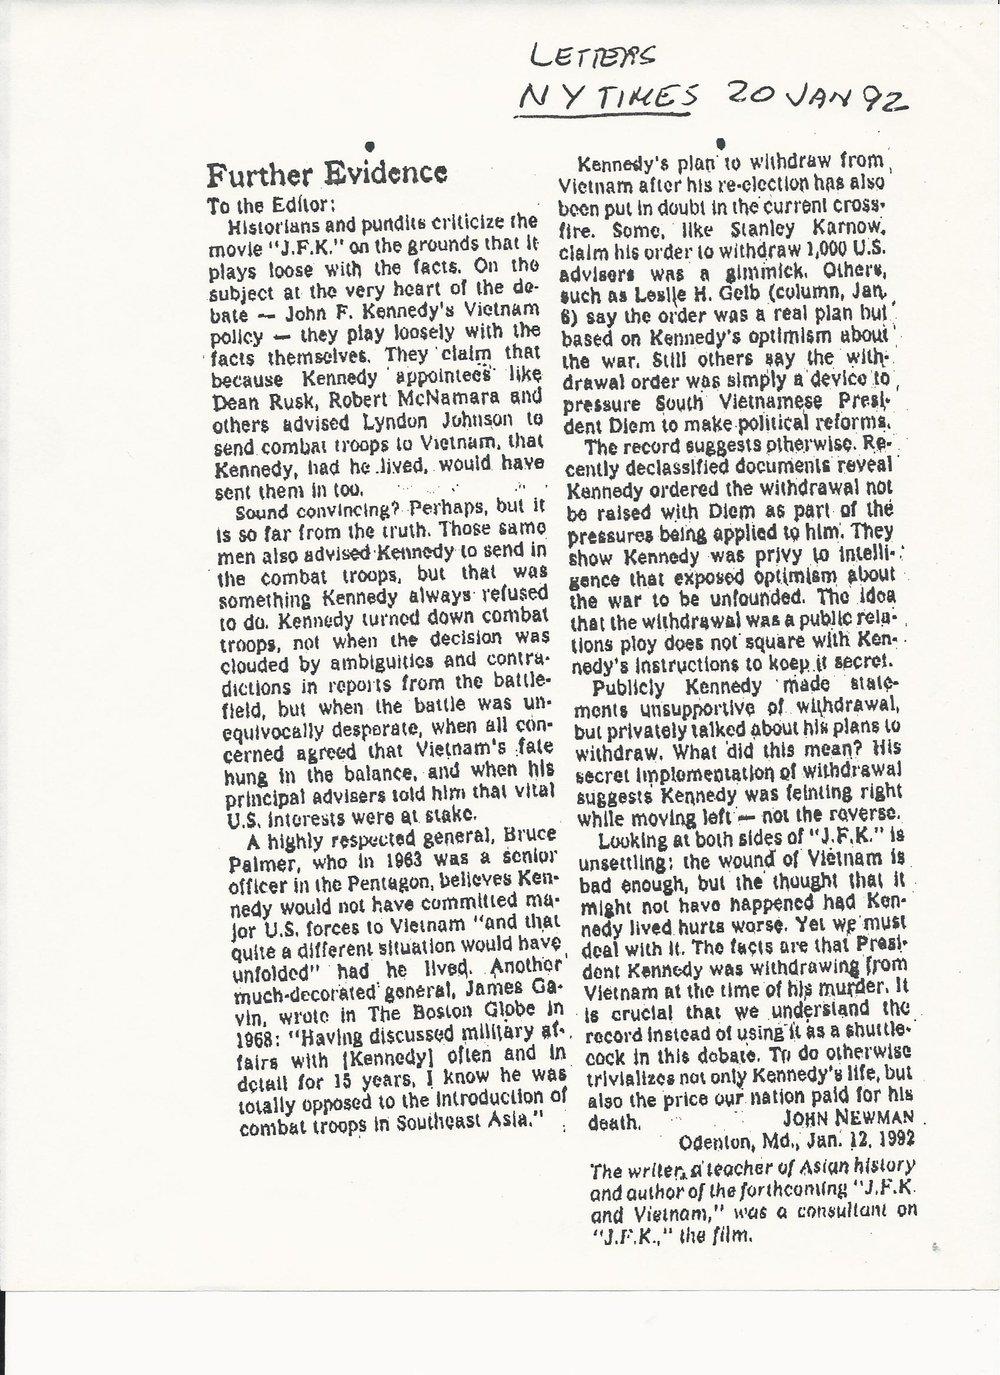 1 20 92 NYT JOHN NEWMAN.jpg